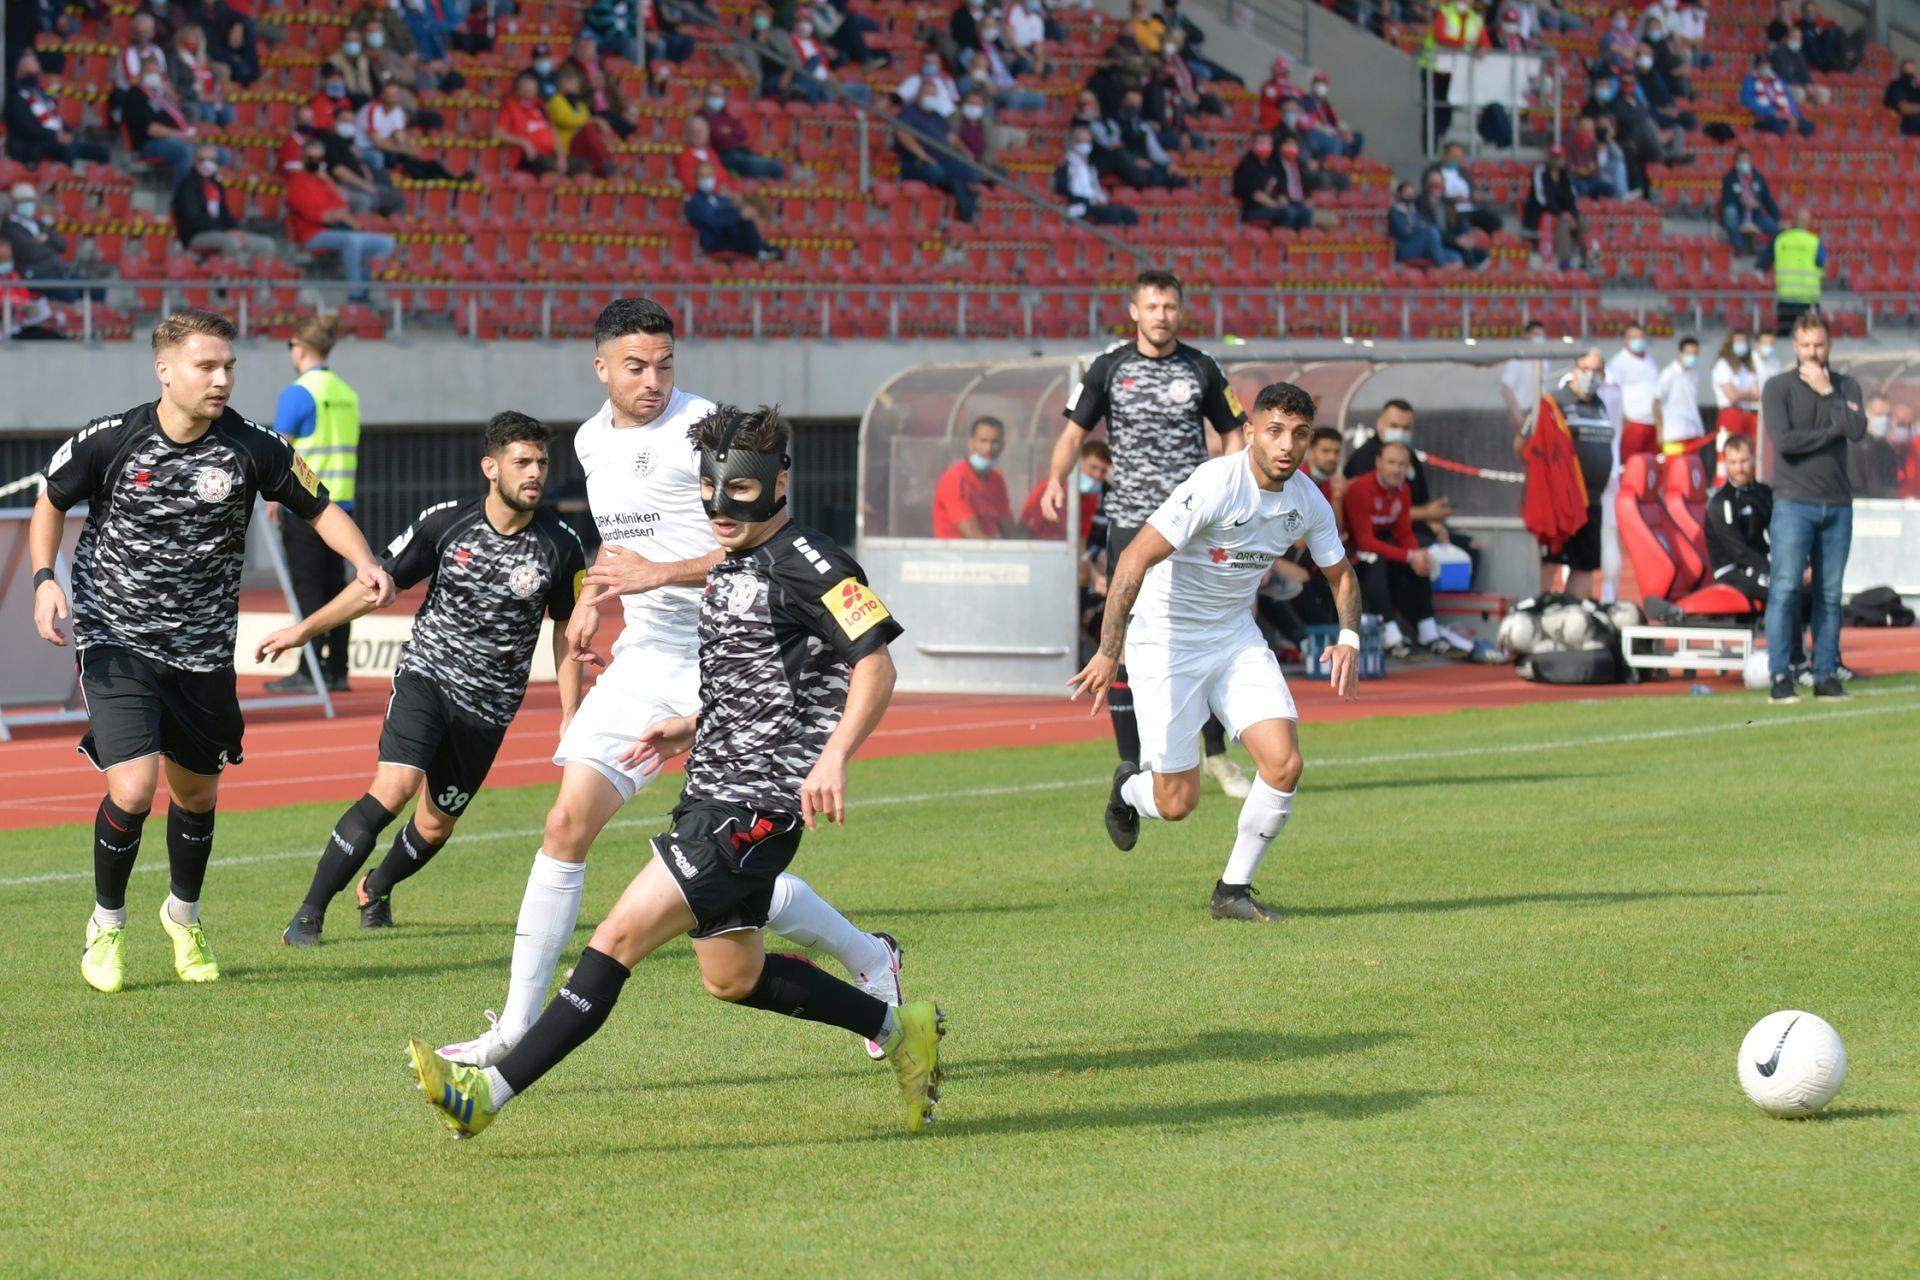 Regionalliga Südwest 2020/21, KSV Hessen Kassel, Rot-Weiss-Koblenz, Endstand 1:1, Adrian Bravo Sanchenz, Nael Najjar